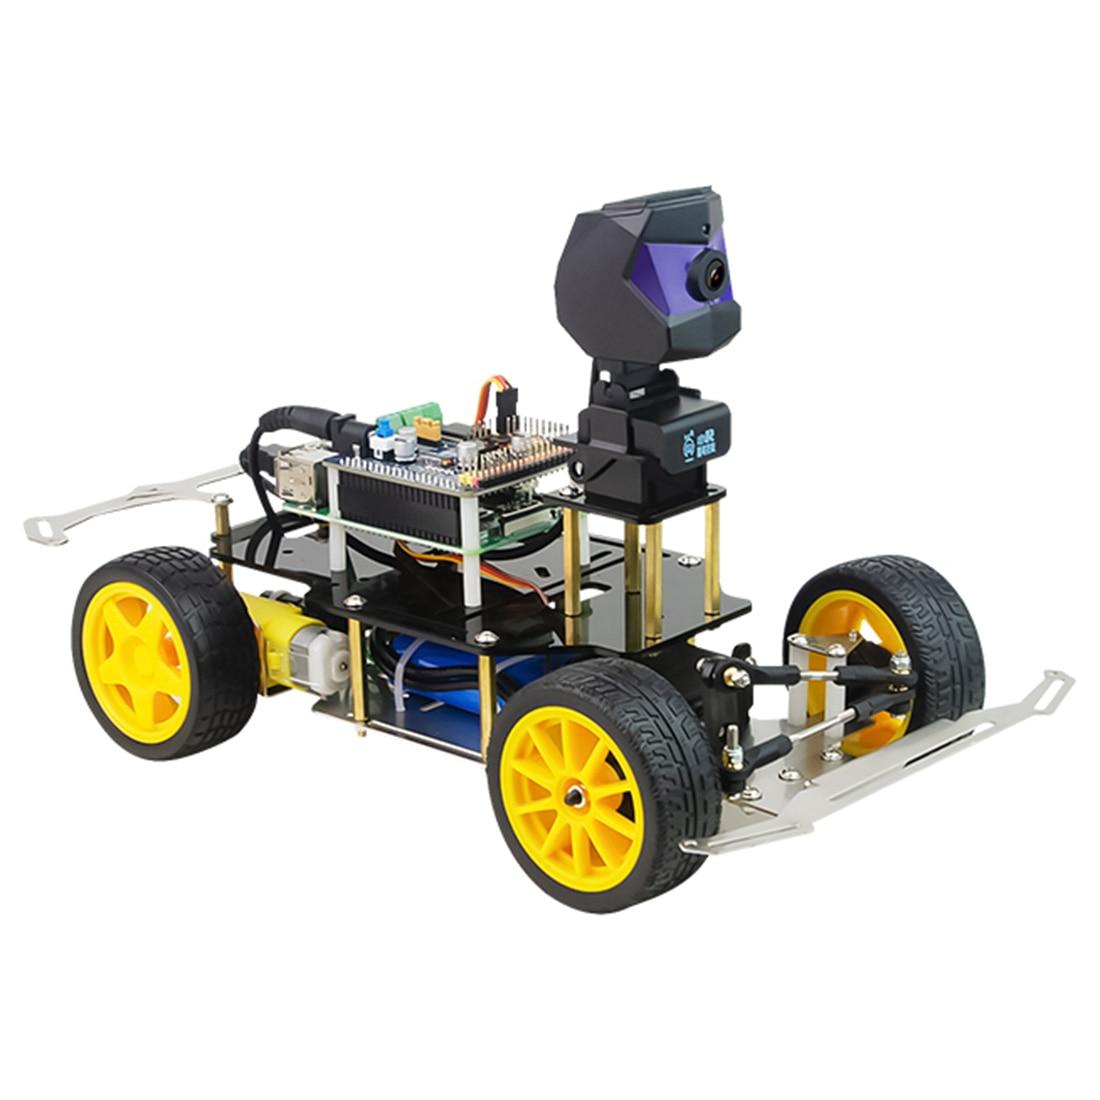 Donkey Car Smart AI Line Follower Robot Opensource DIY Self Driving Platform For Raspberry Pi RC Car Programmable Toys For Kids